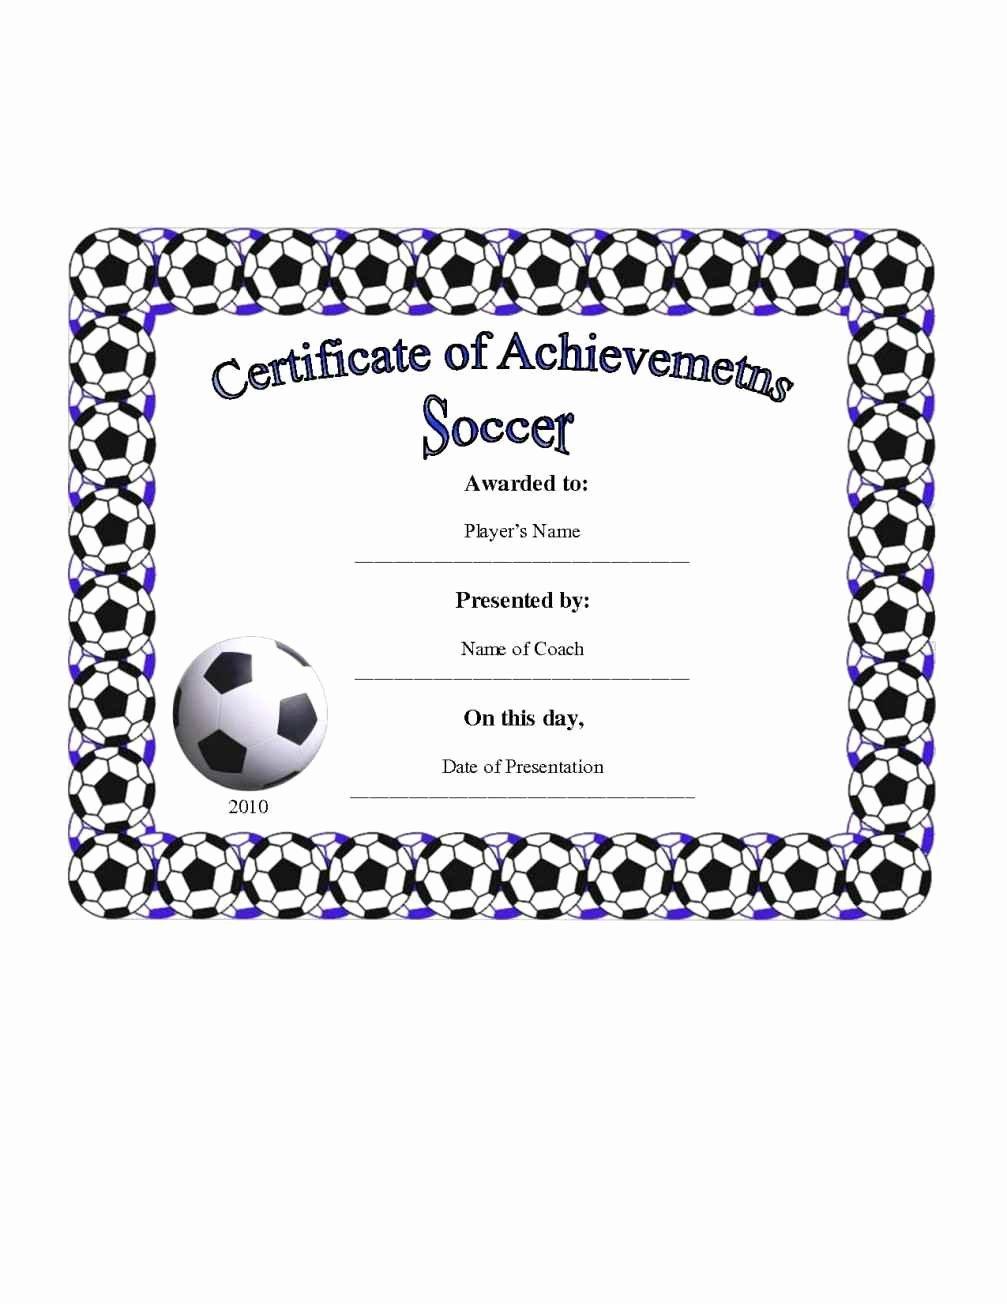 Football Award Certificate Template Beautiful Football Certificate Templates Template Update234